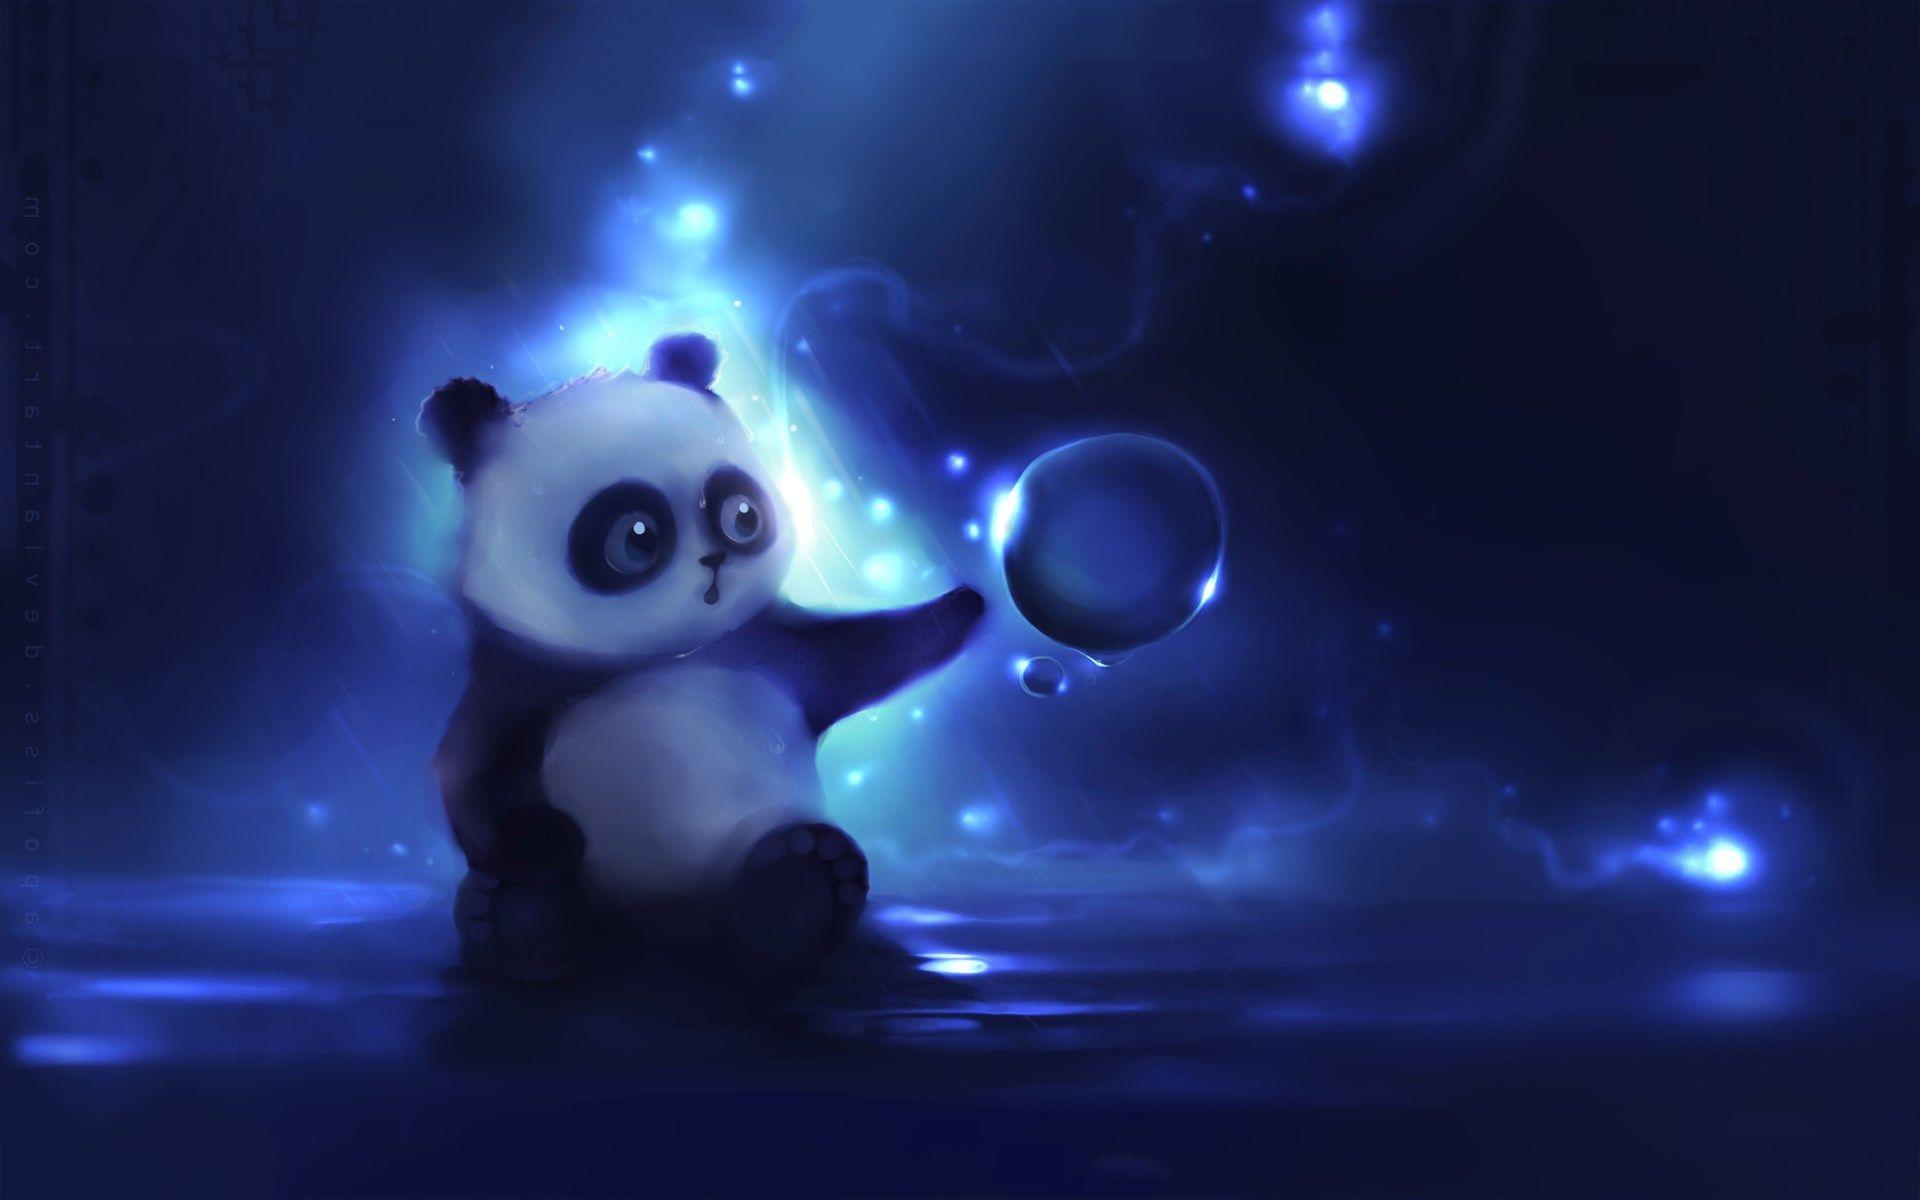 Hdq Images Cute Pandas Pic 502 Kb Barden Sinclair Panda Art Panda Wallpapers Panda Background